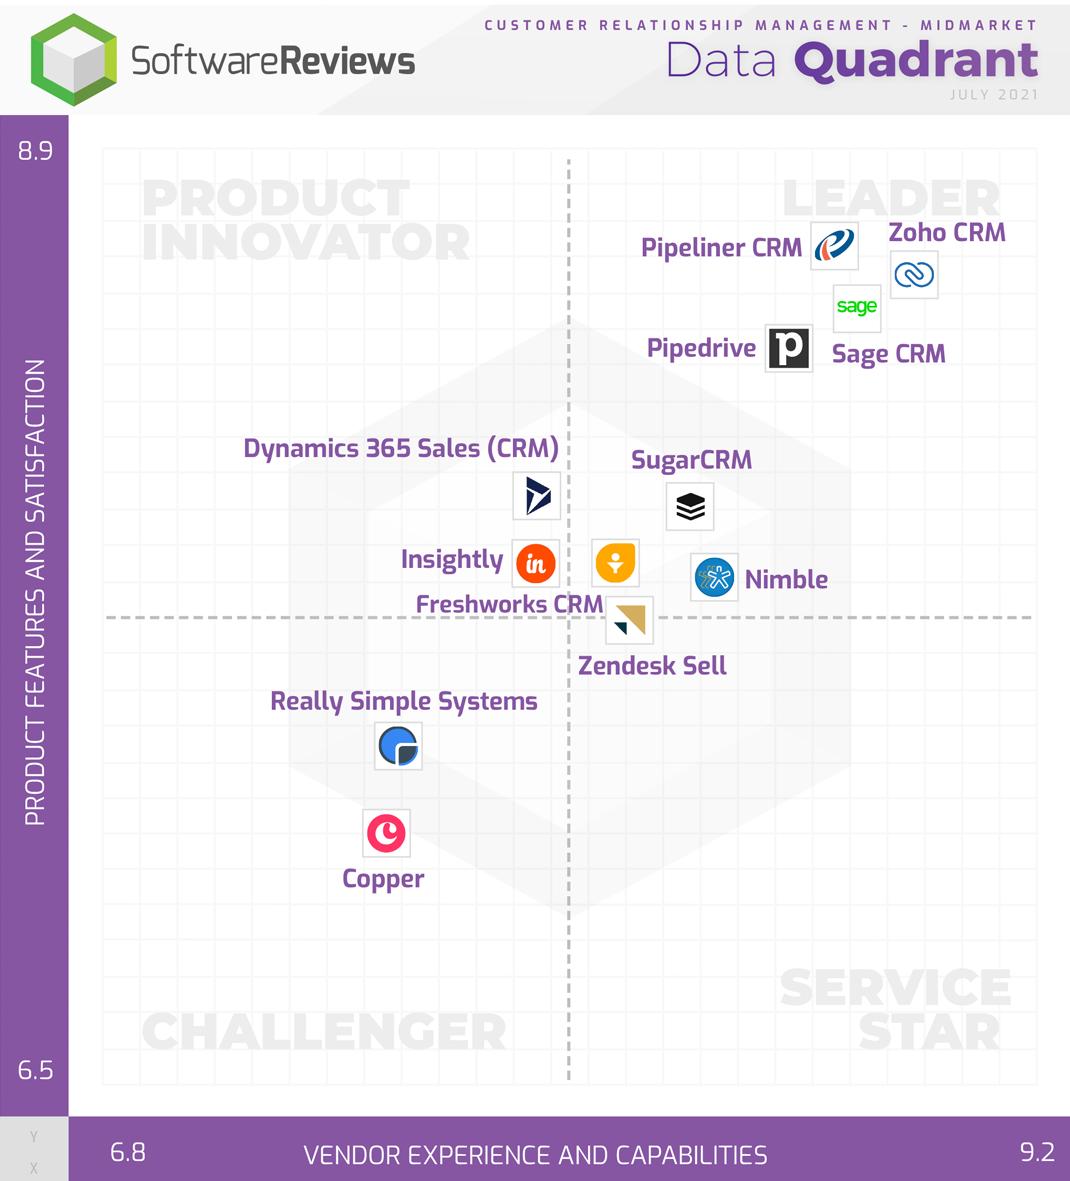 Customer Relationship Management - Midmarket Data Quadrant